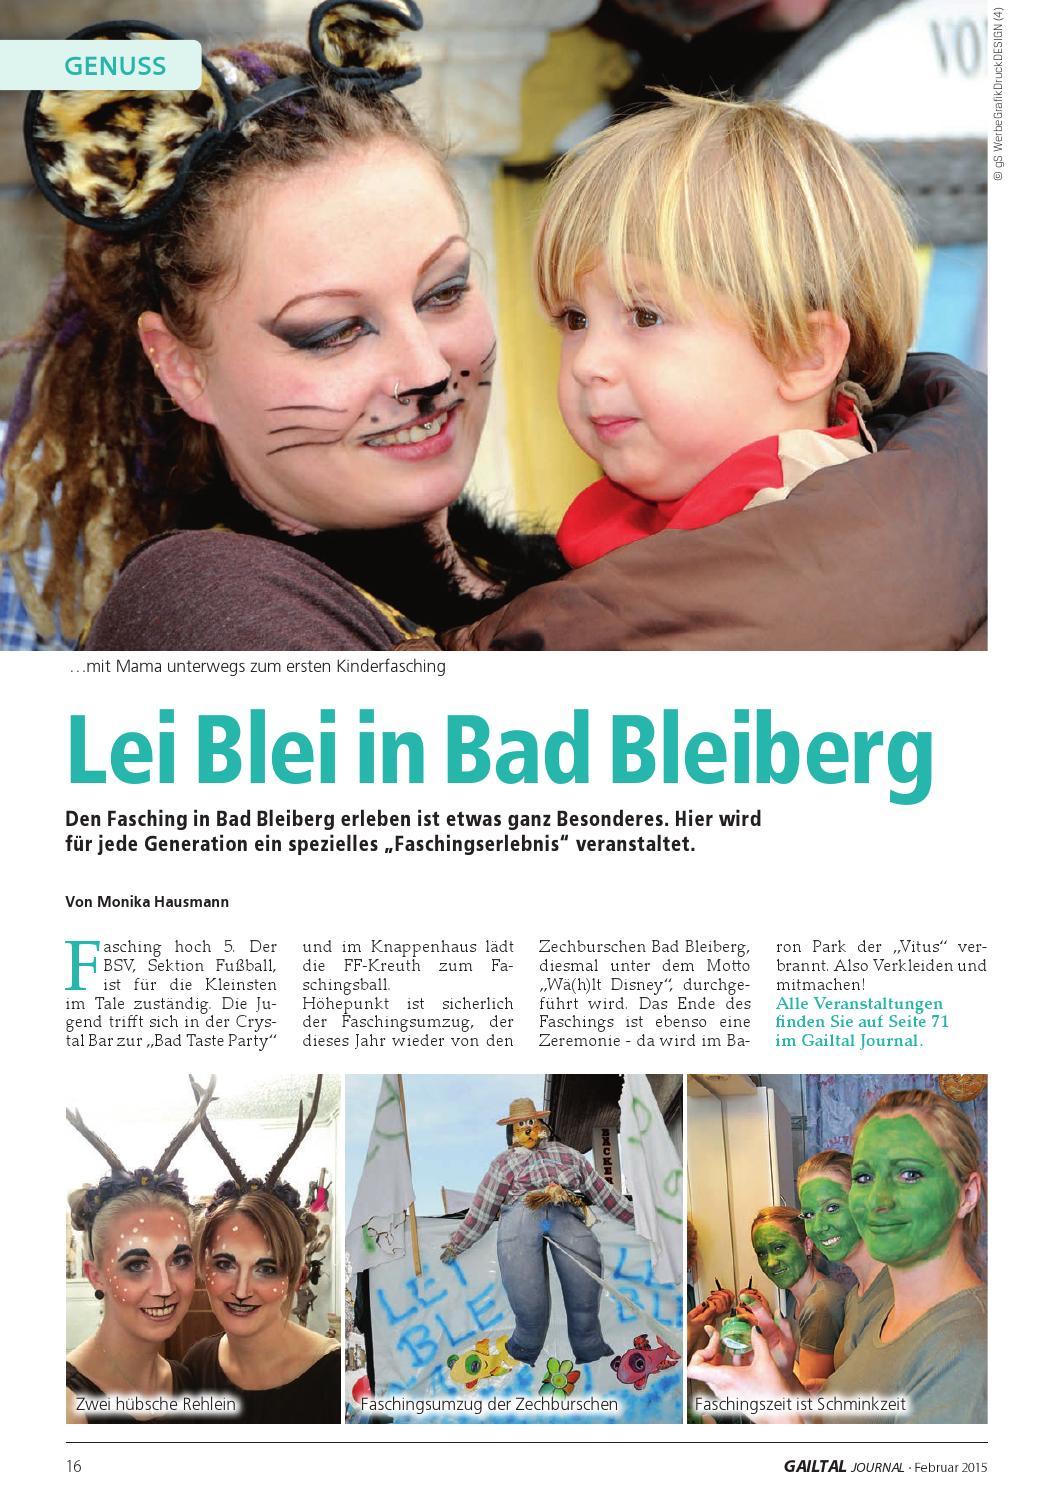 Gailtal Journal Februar 2015 By Daniel Kattnig Issuu